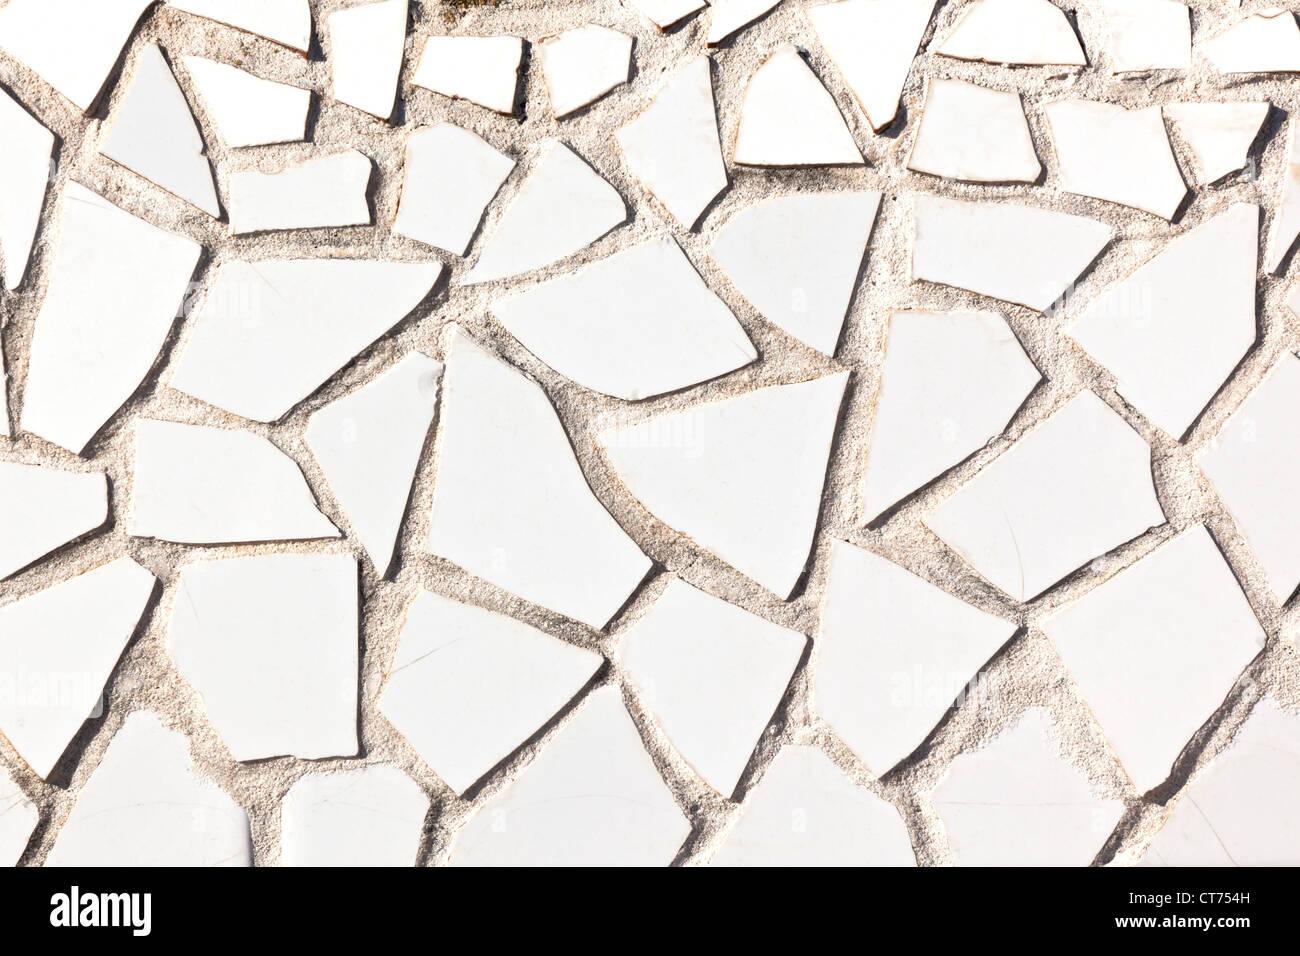 Broken white tile mosaic background horizontal shot stock photo broken white tile mosaic background horizontal shot dailygadgetfo Gallery